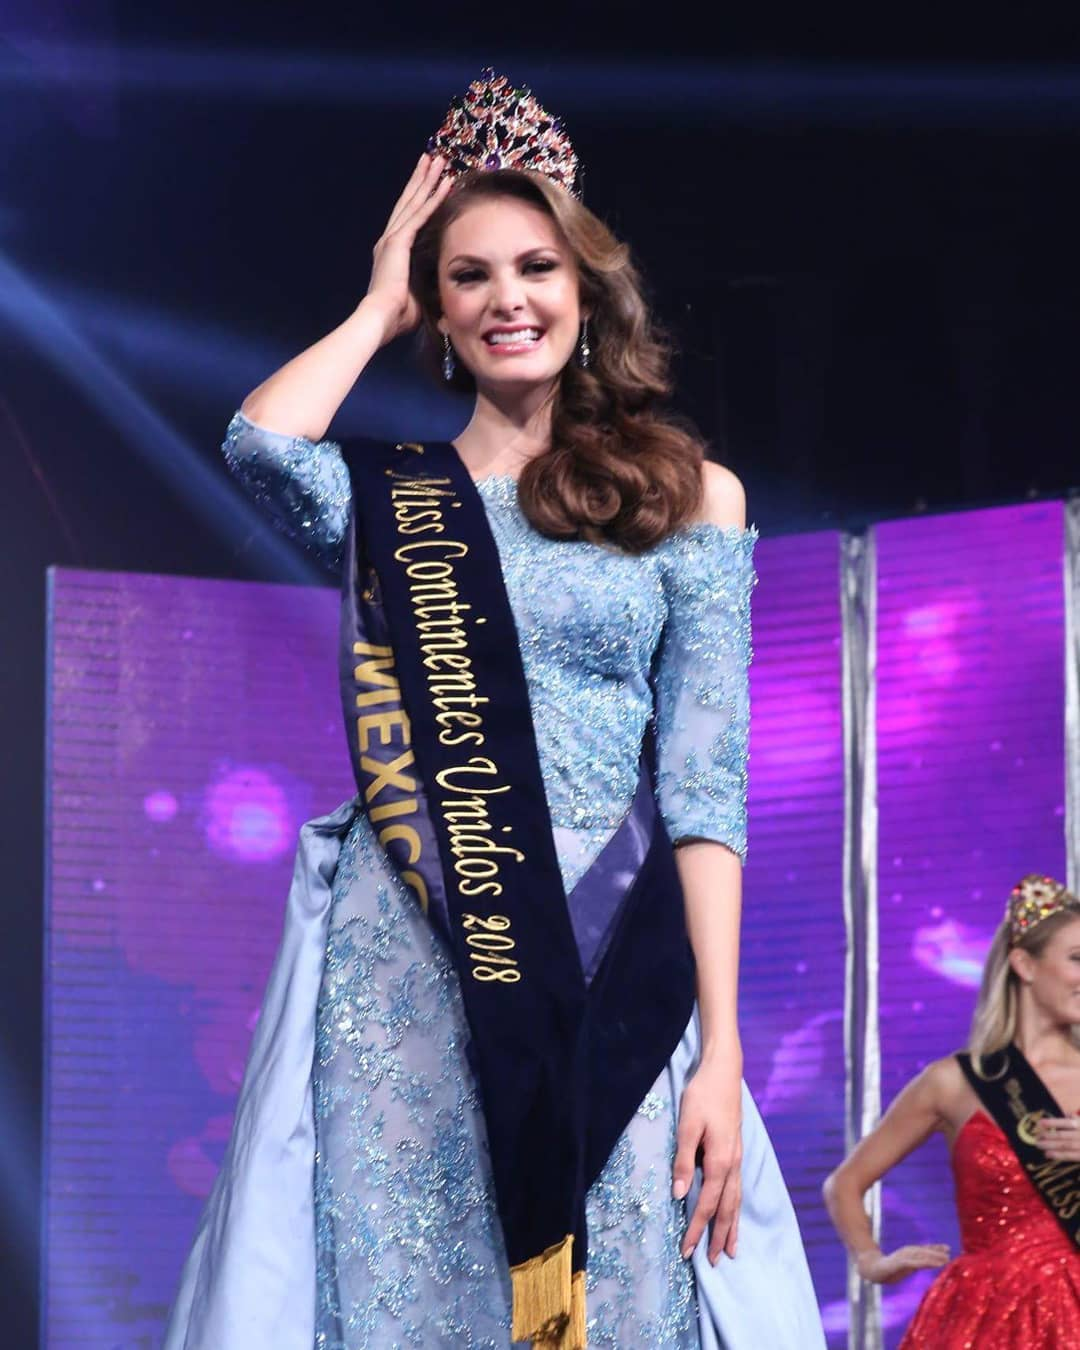 andrea saenz, miss continentes unidos 2018. - Página 5 41307510